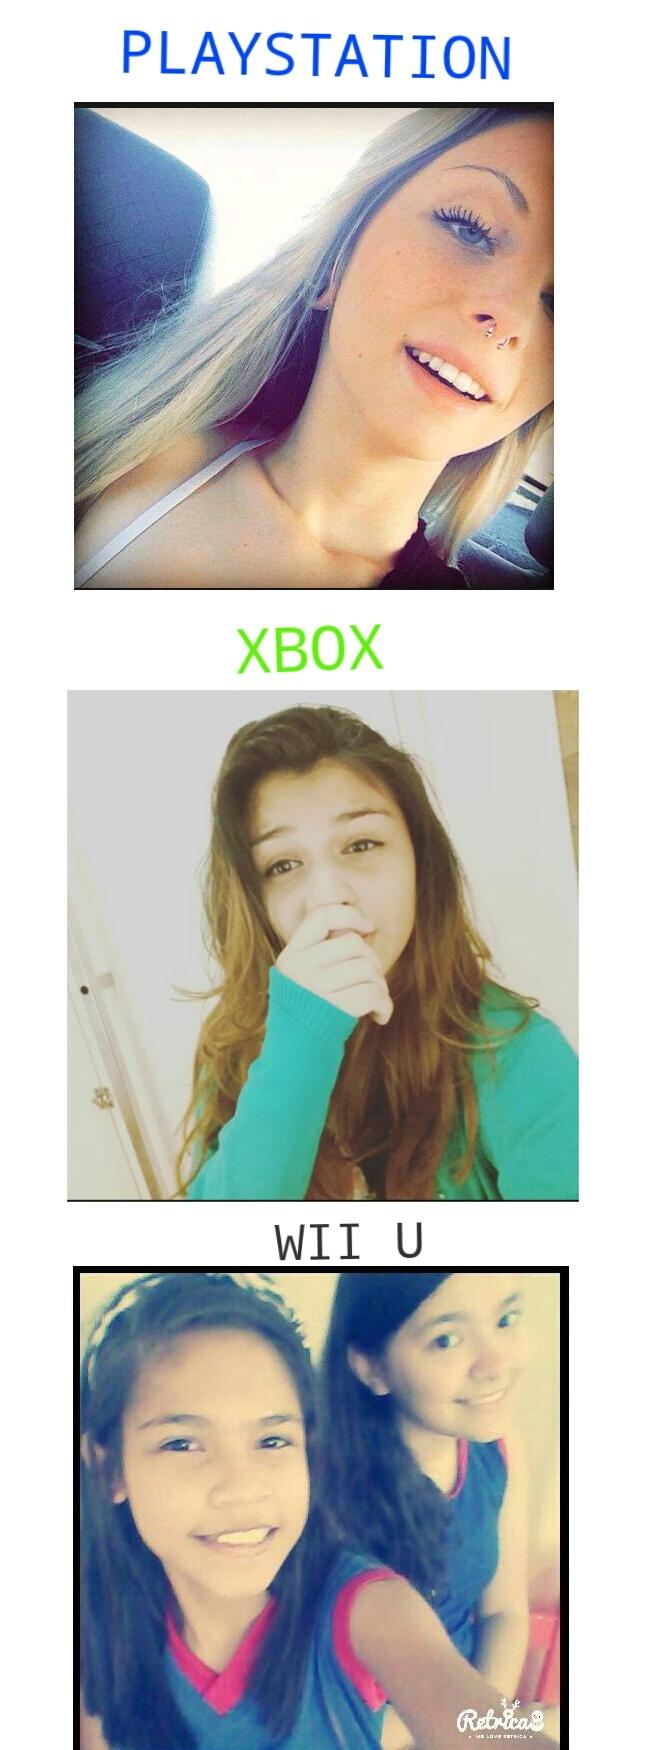 Playstation vs Xbox vs Wiiu - meme